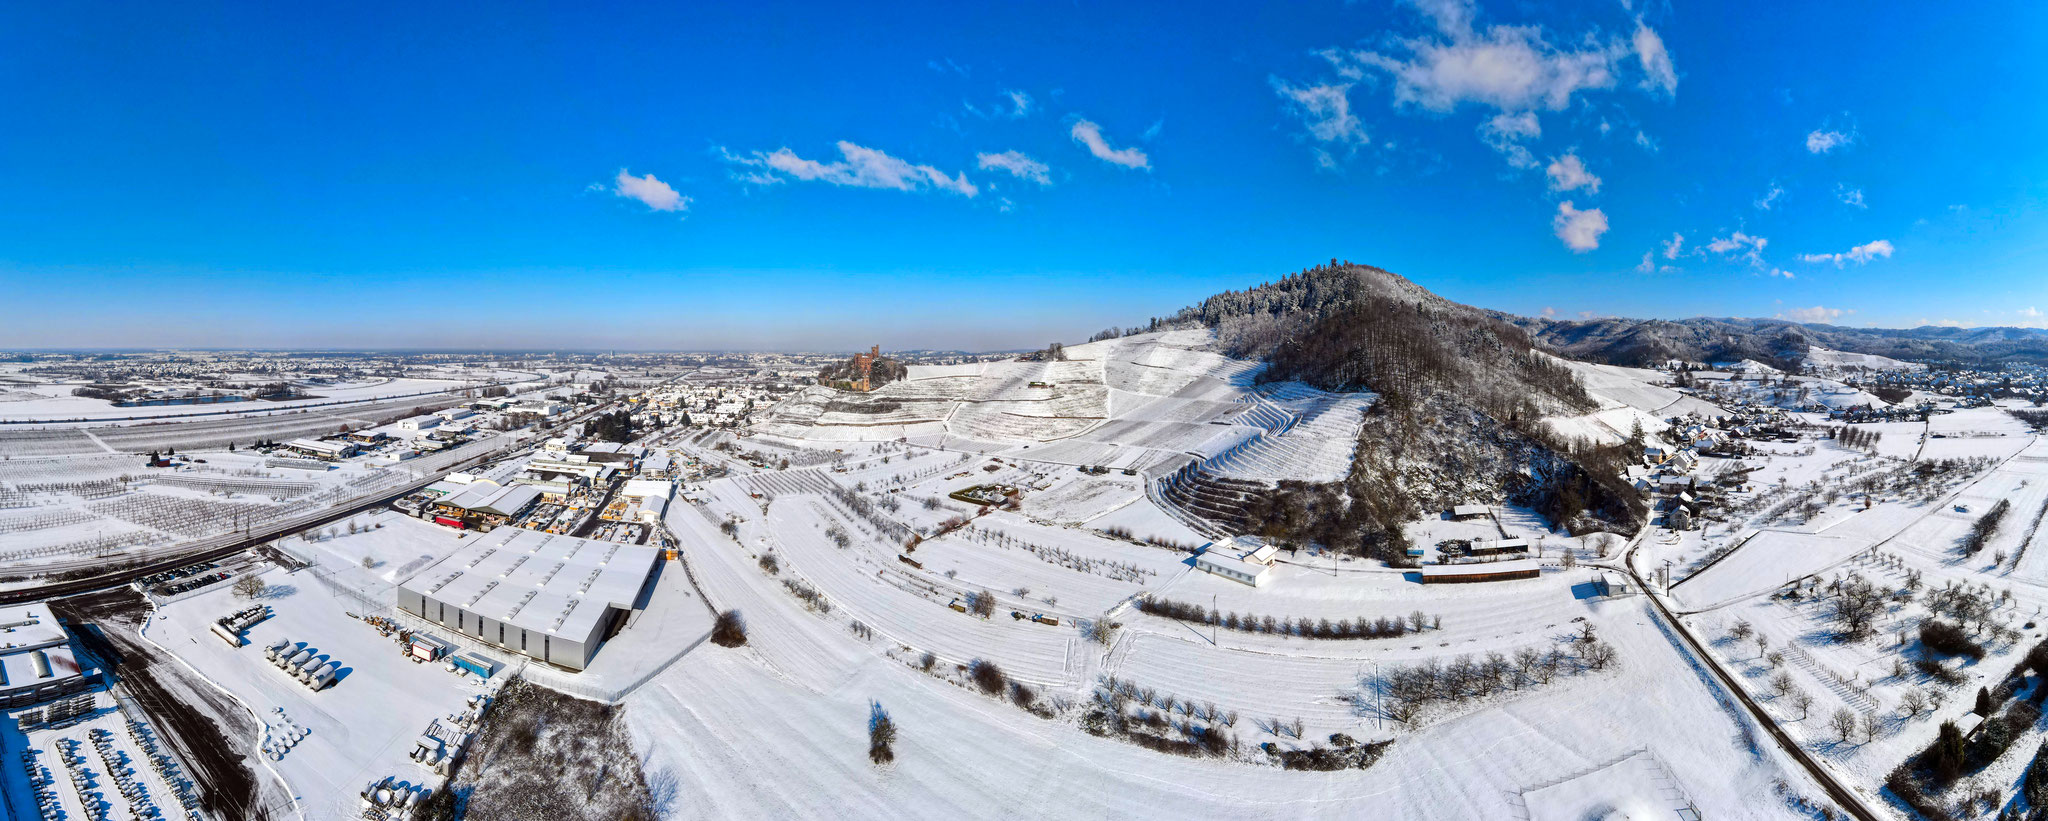 Winter - Panorama über Ortenberg